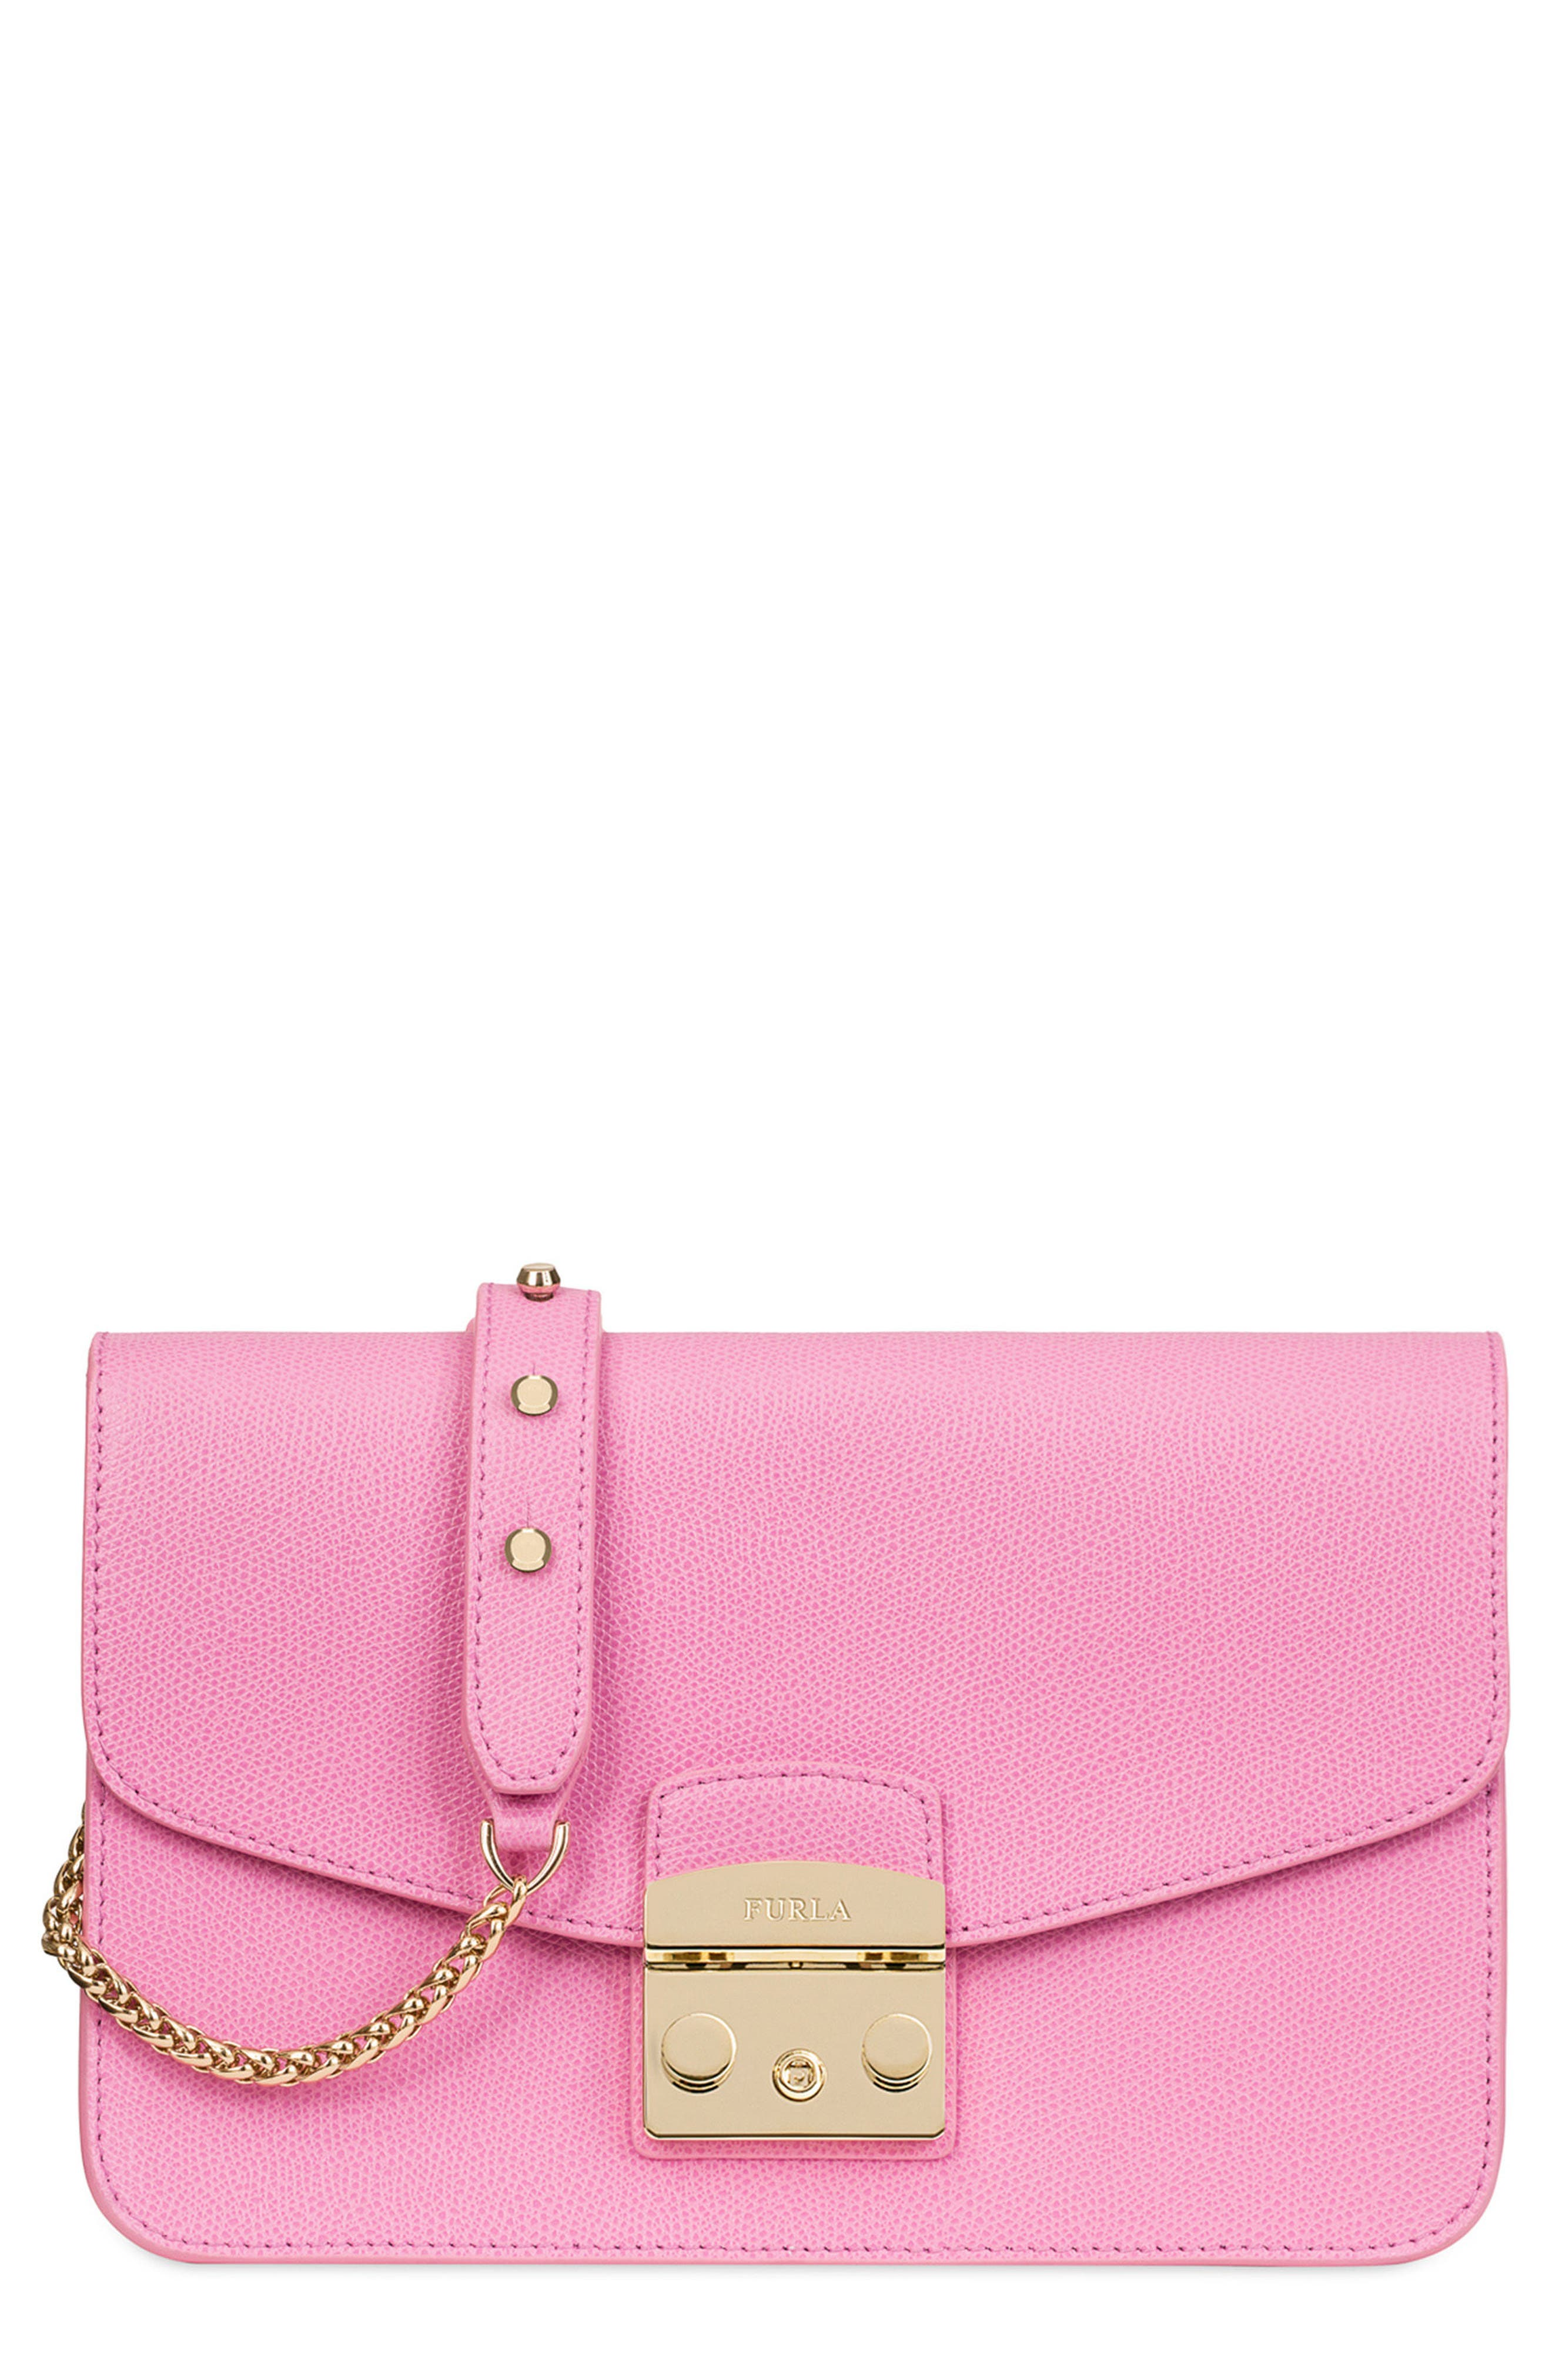 Main Image - Furla Small Metropolis Leather Crossbody Bag